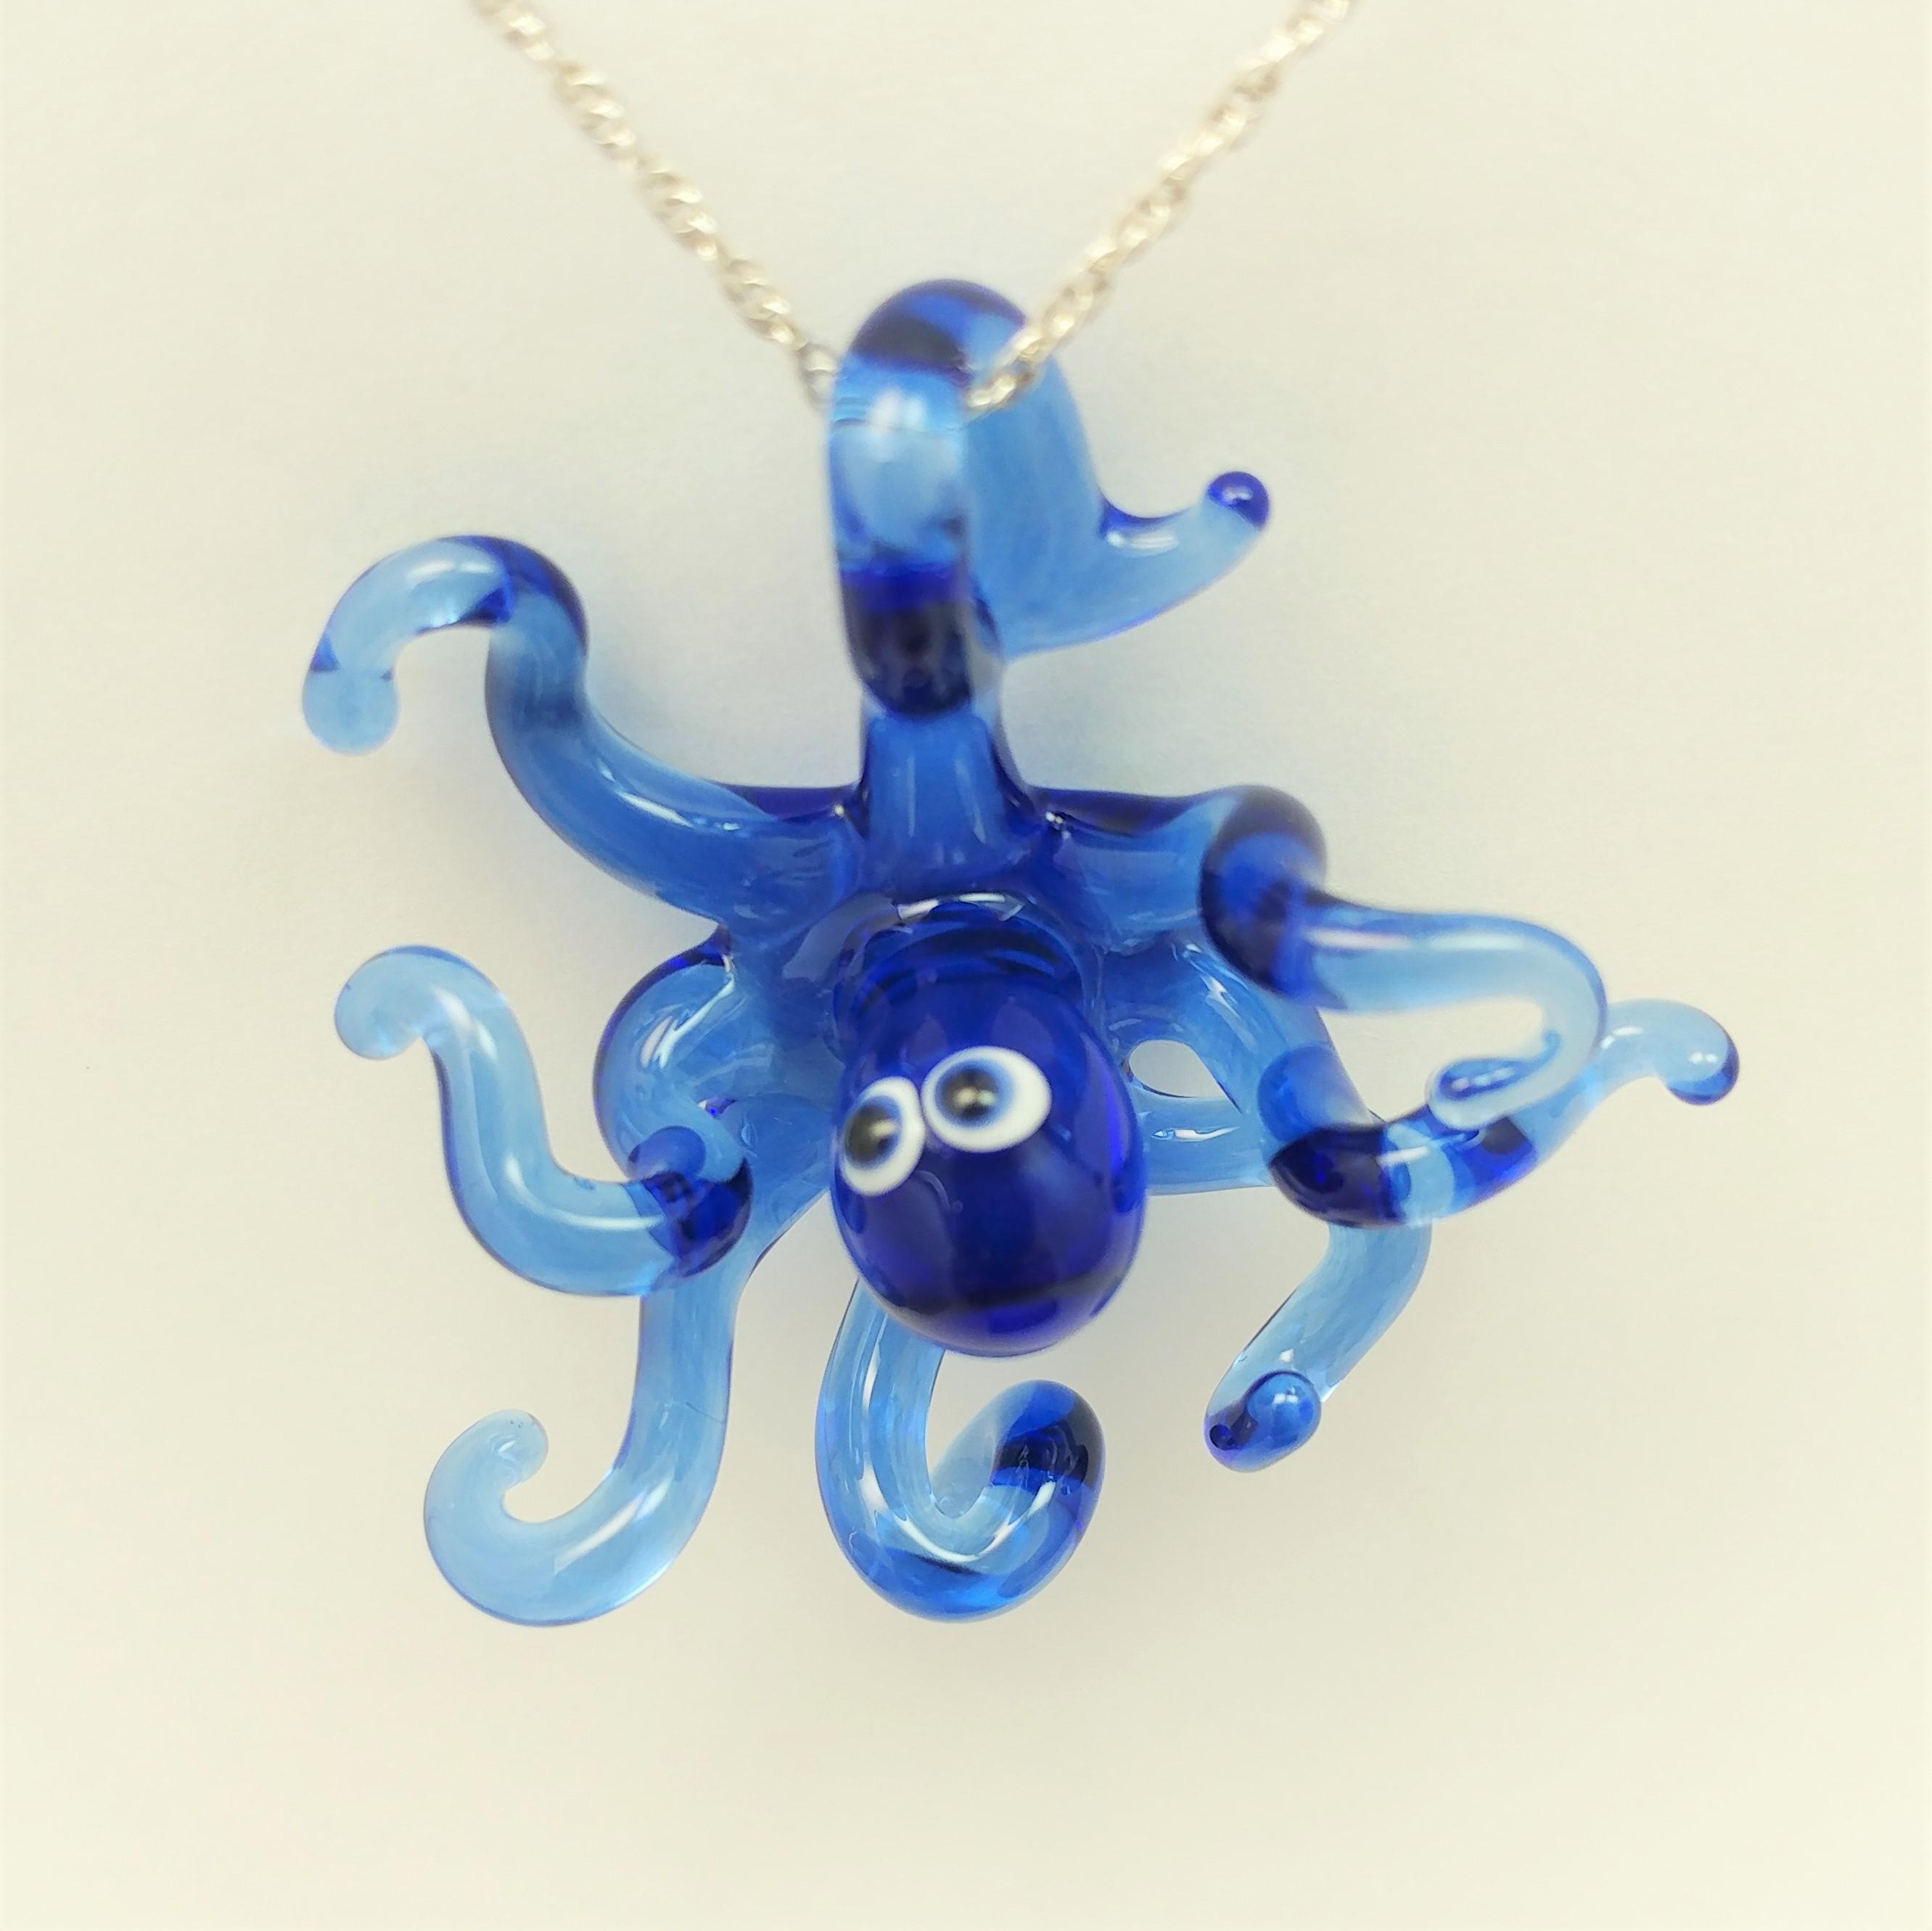 Blue Octopus pendant